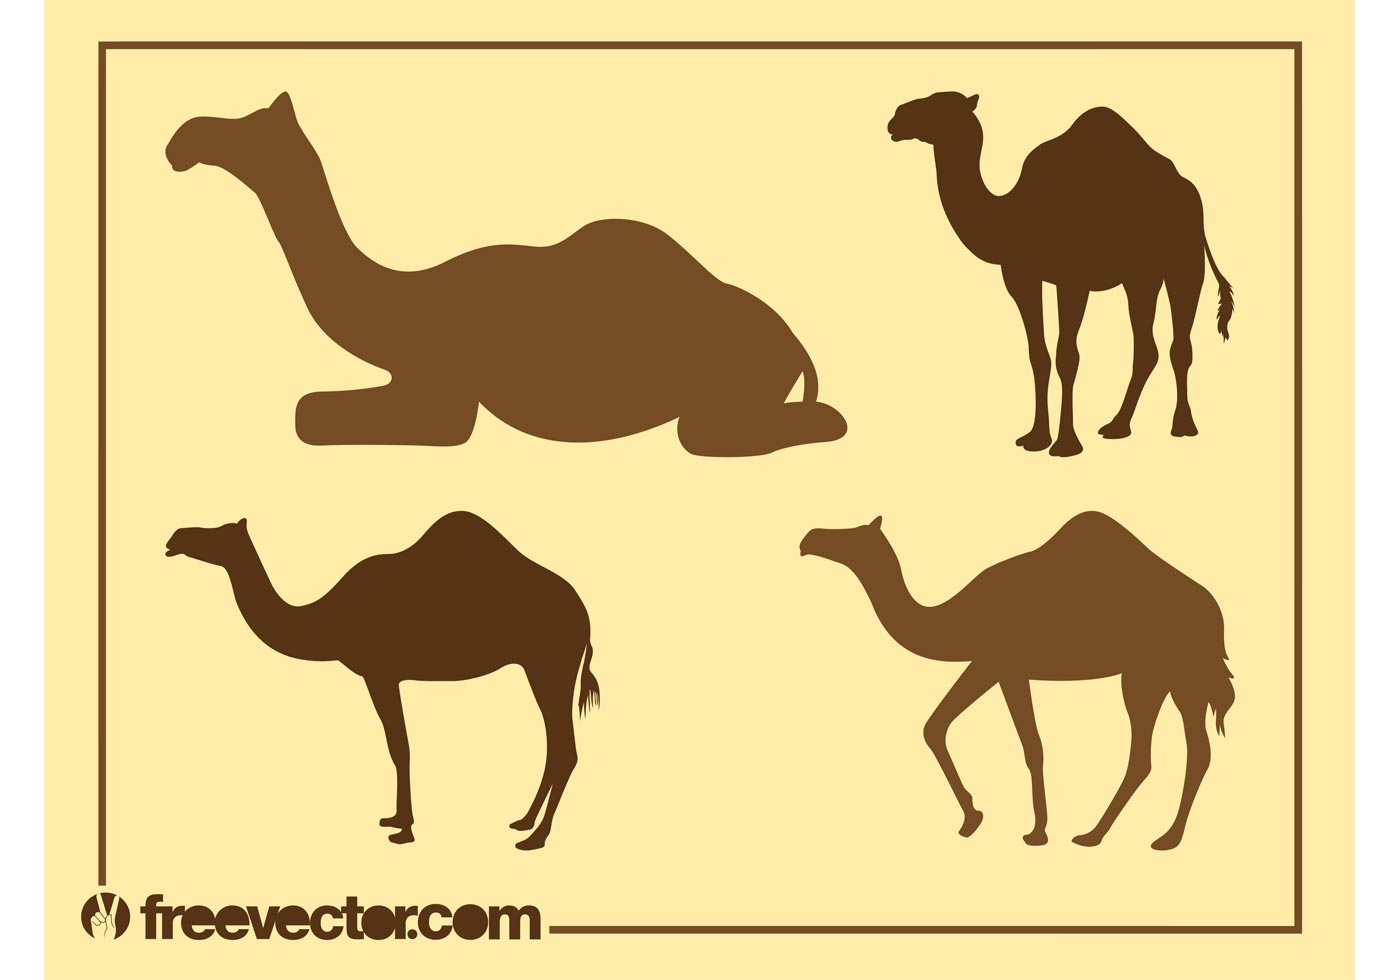 camel silhouettes graphics download free vector art yak cip art yak clip art outline